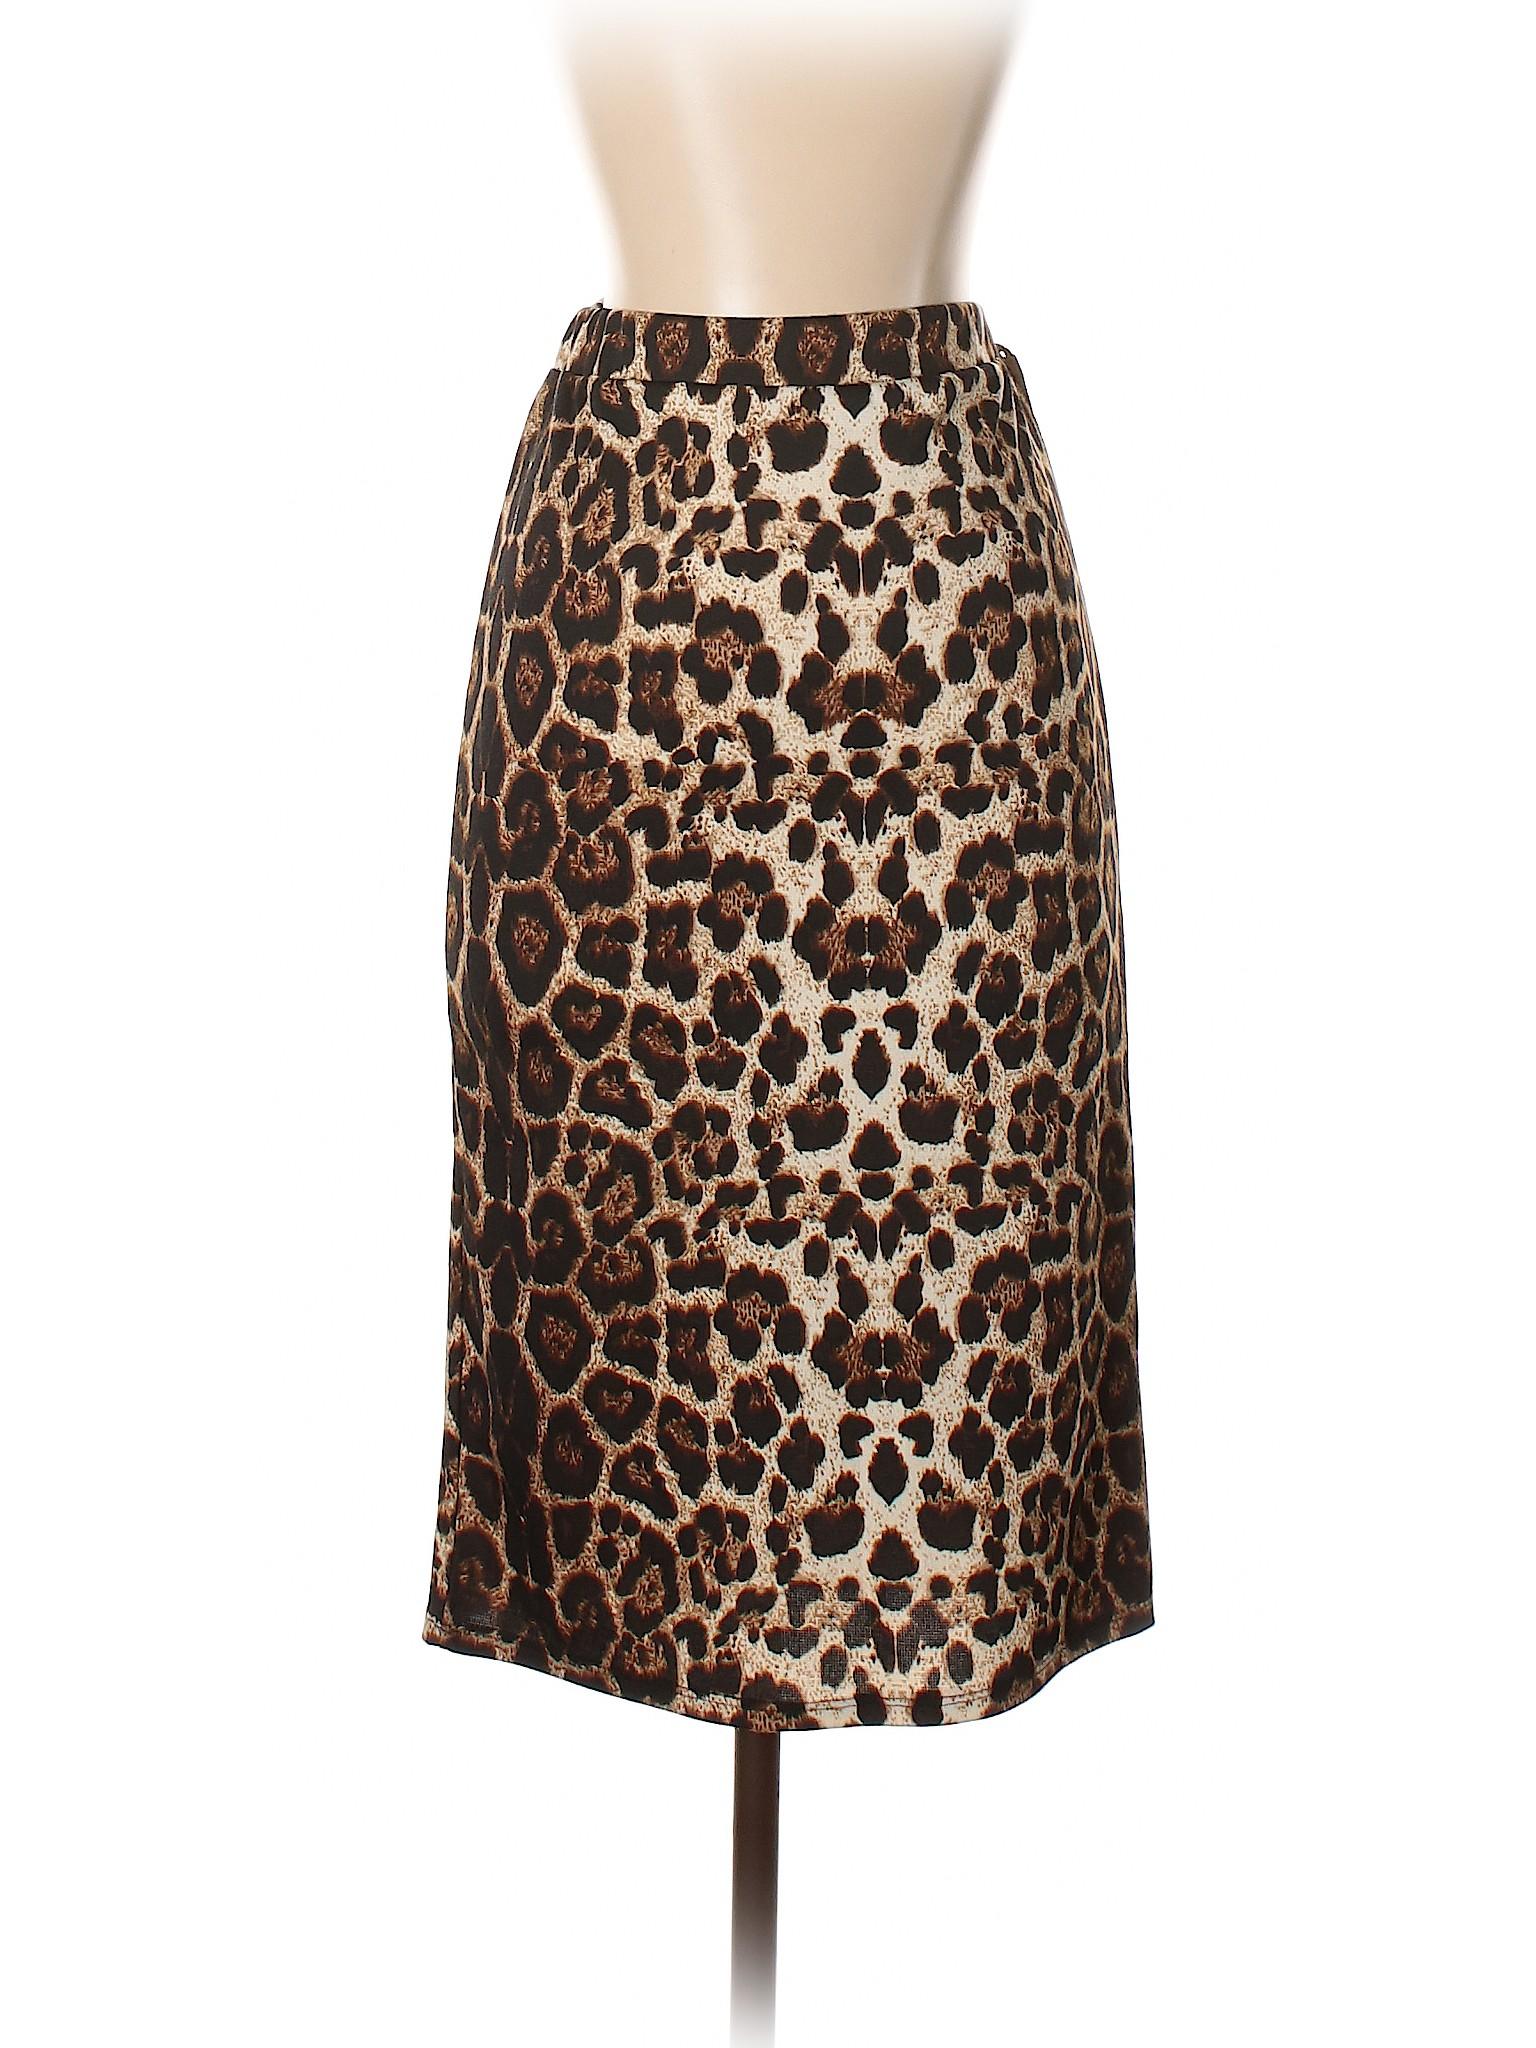 Casual Boutique Boutique Casual Skirt Casual Boutique Skirt Casual Boutique Skirt Skirt Casual Boutique rwAr48xnq